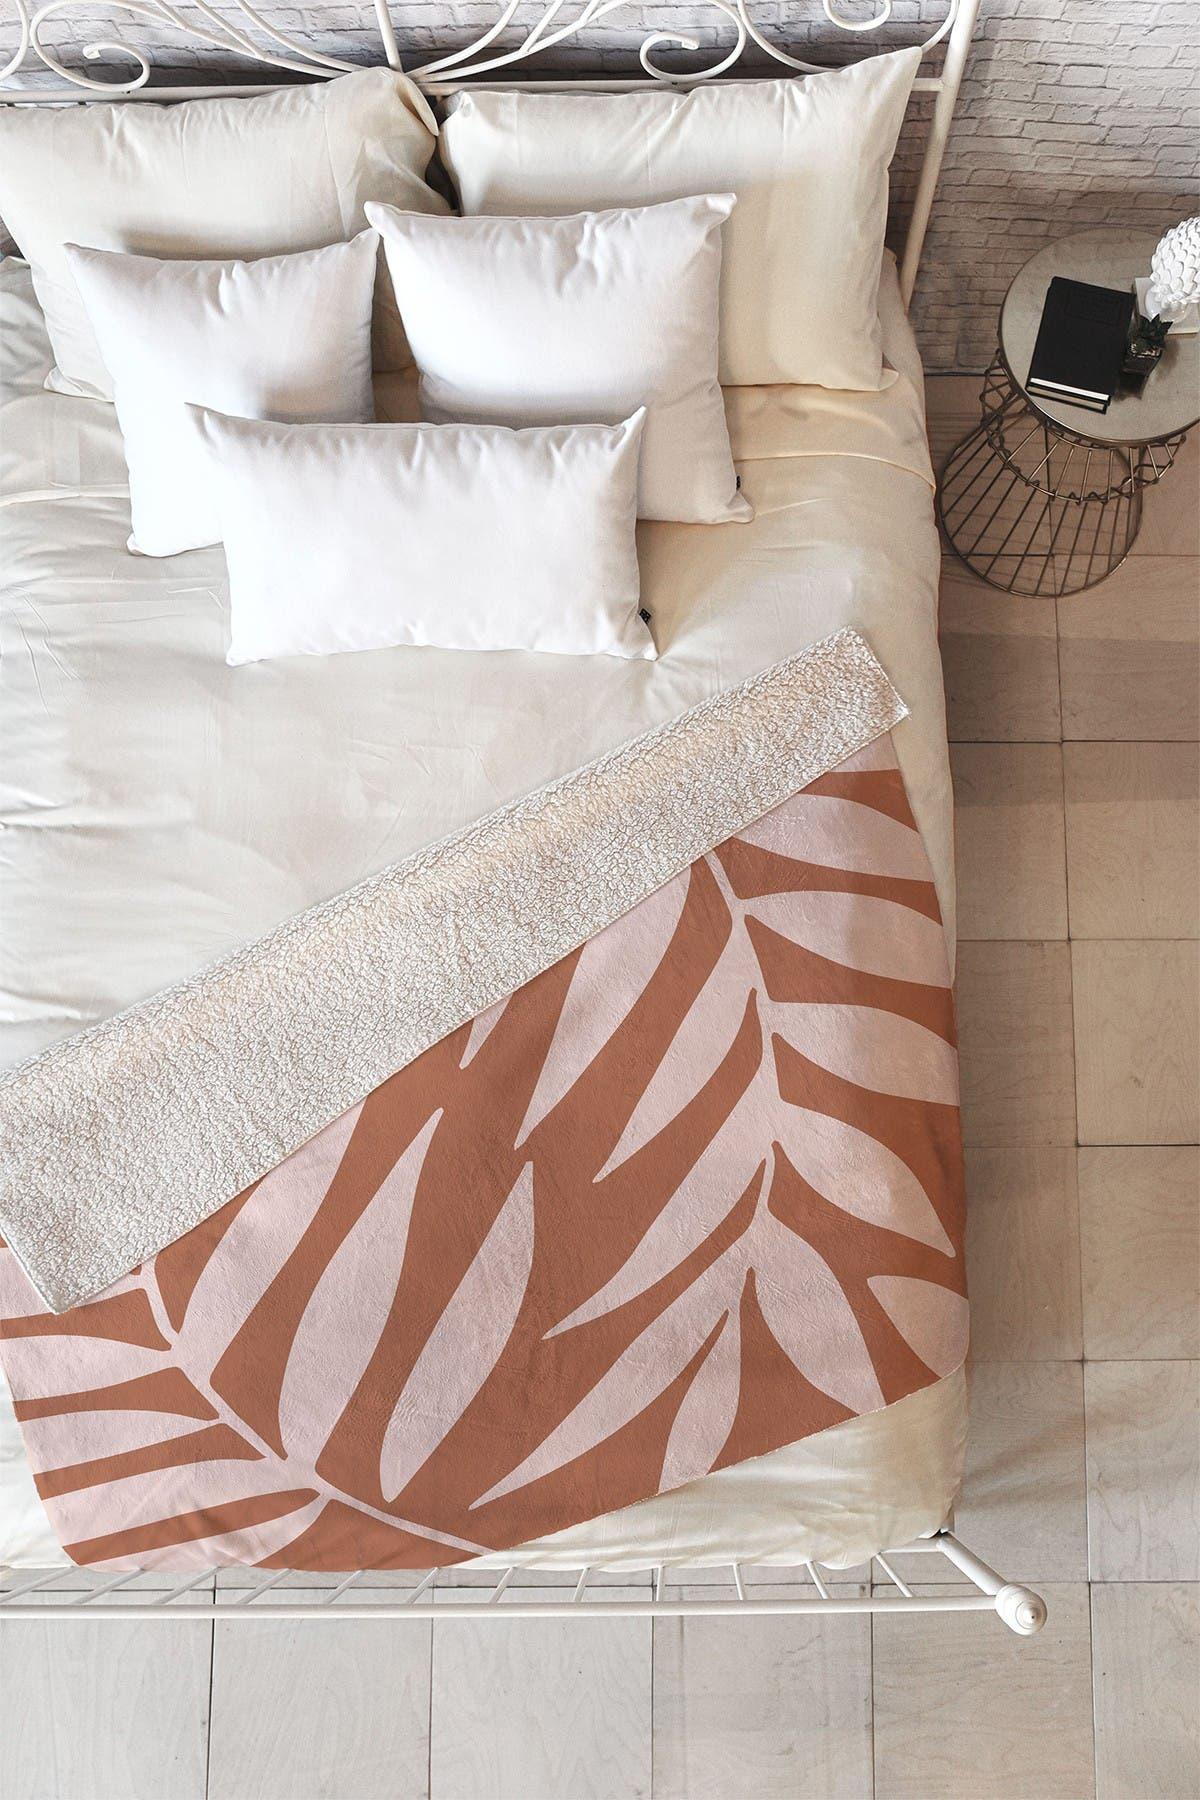 Image of Deny Designs Emanuela Carratoni Pink Palms on Baked Earth Faux Shearling Fleece Blanket